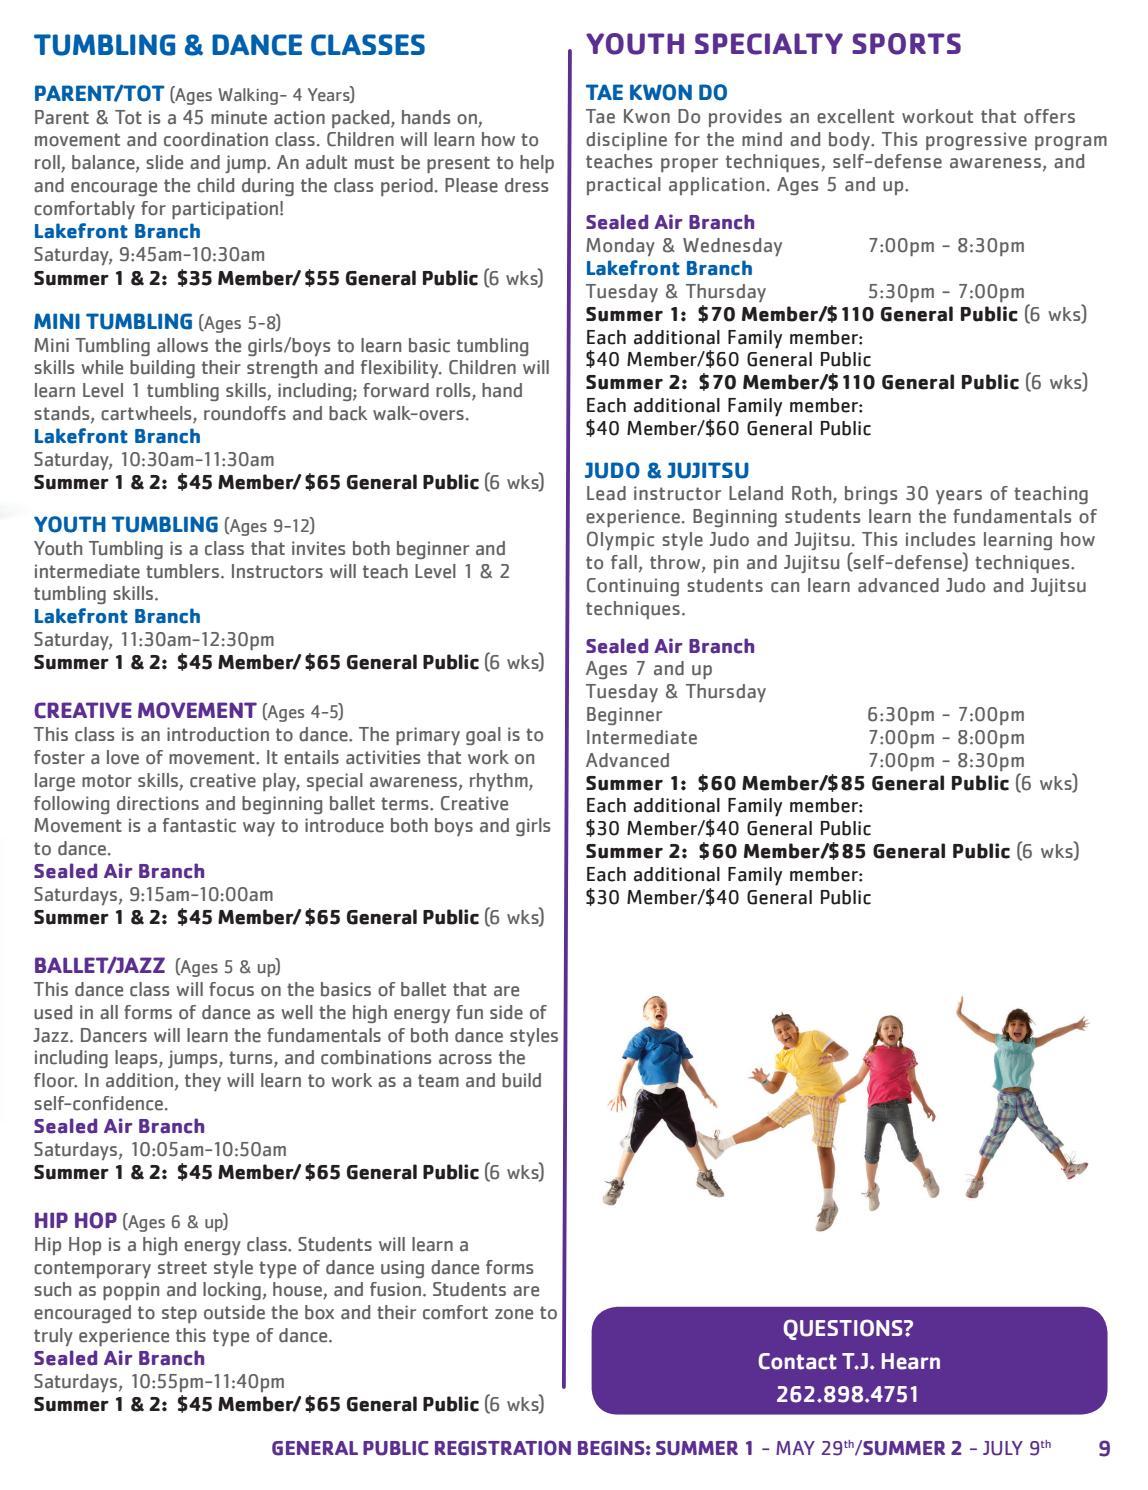 2018 Racine Family YMCA Summer Brochure by RACINE FAMILY